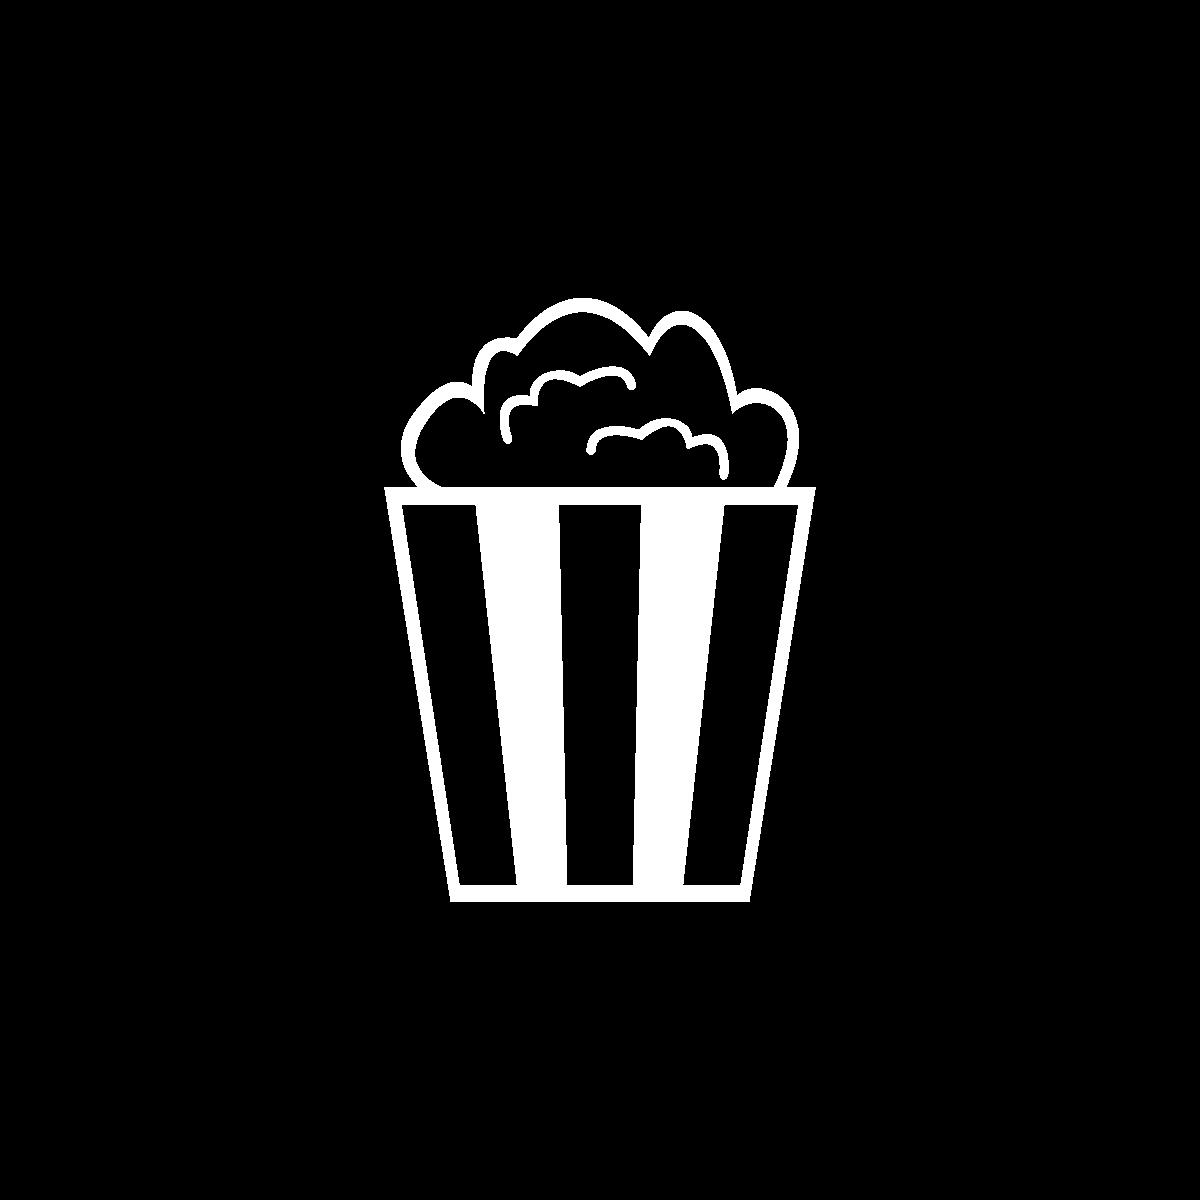 1R2com, Événementiel, Popcorn